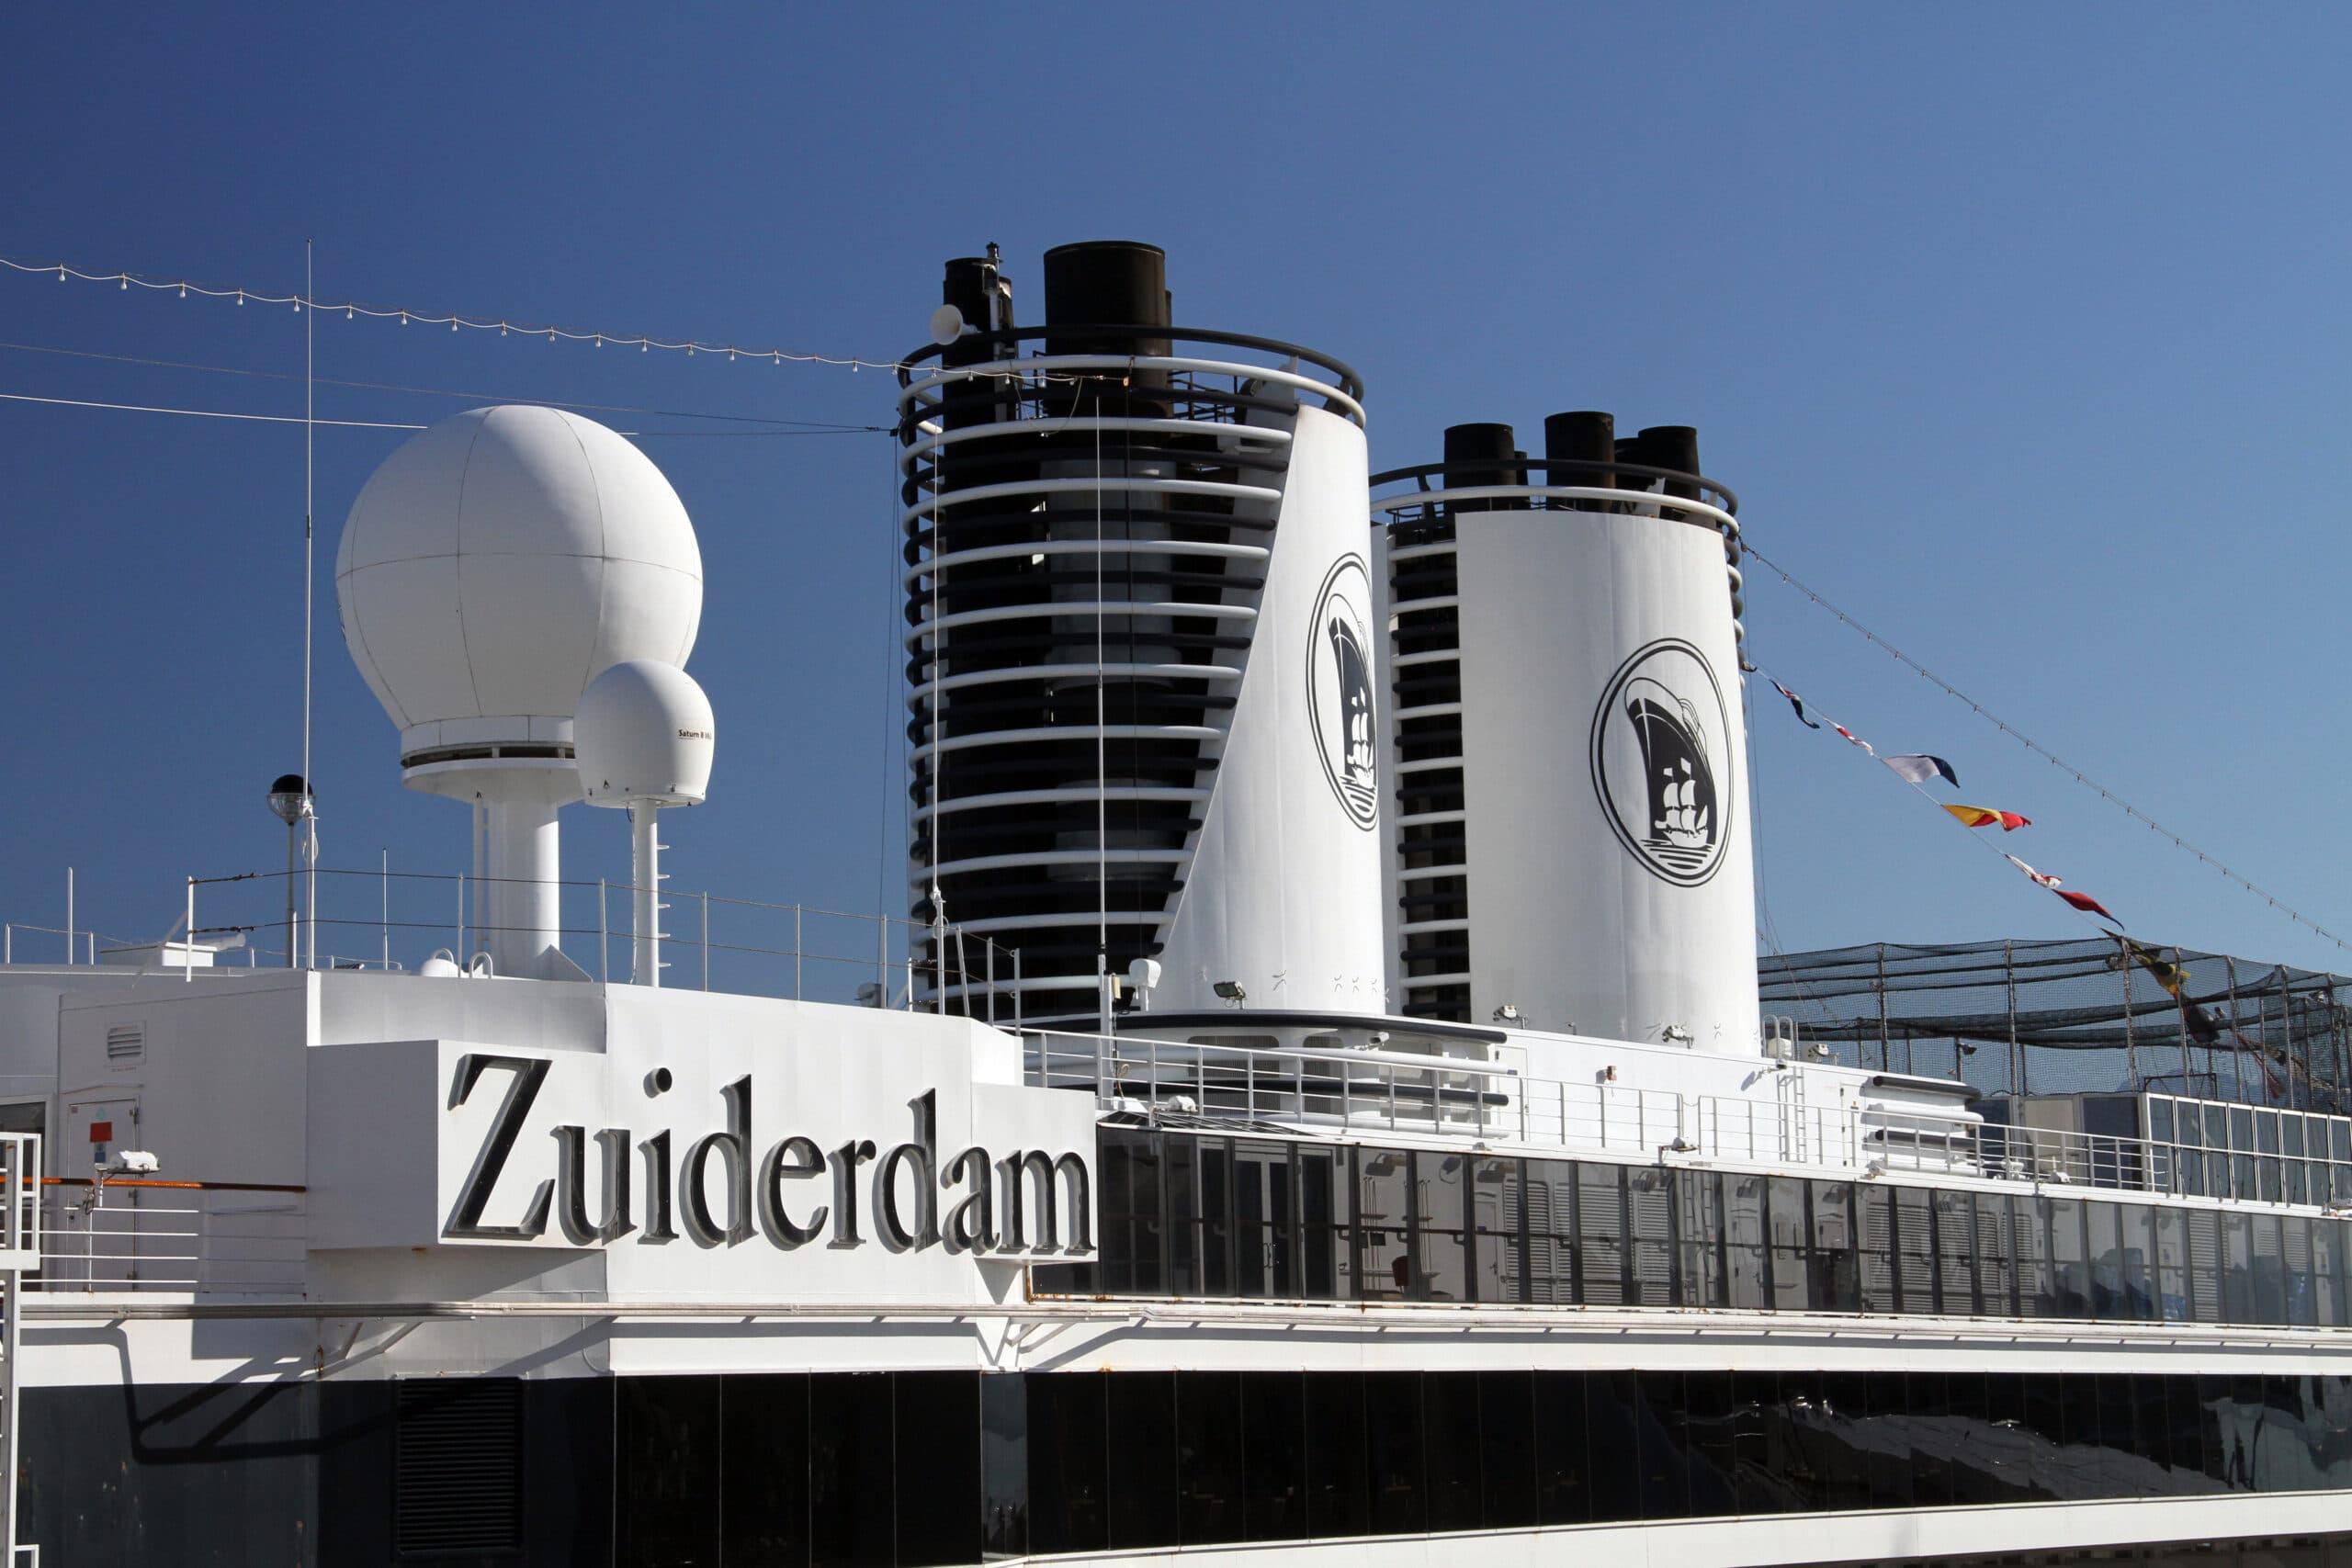 Zuiderdam-Holland America Line-Cruiseschip